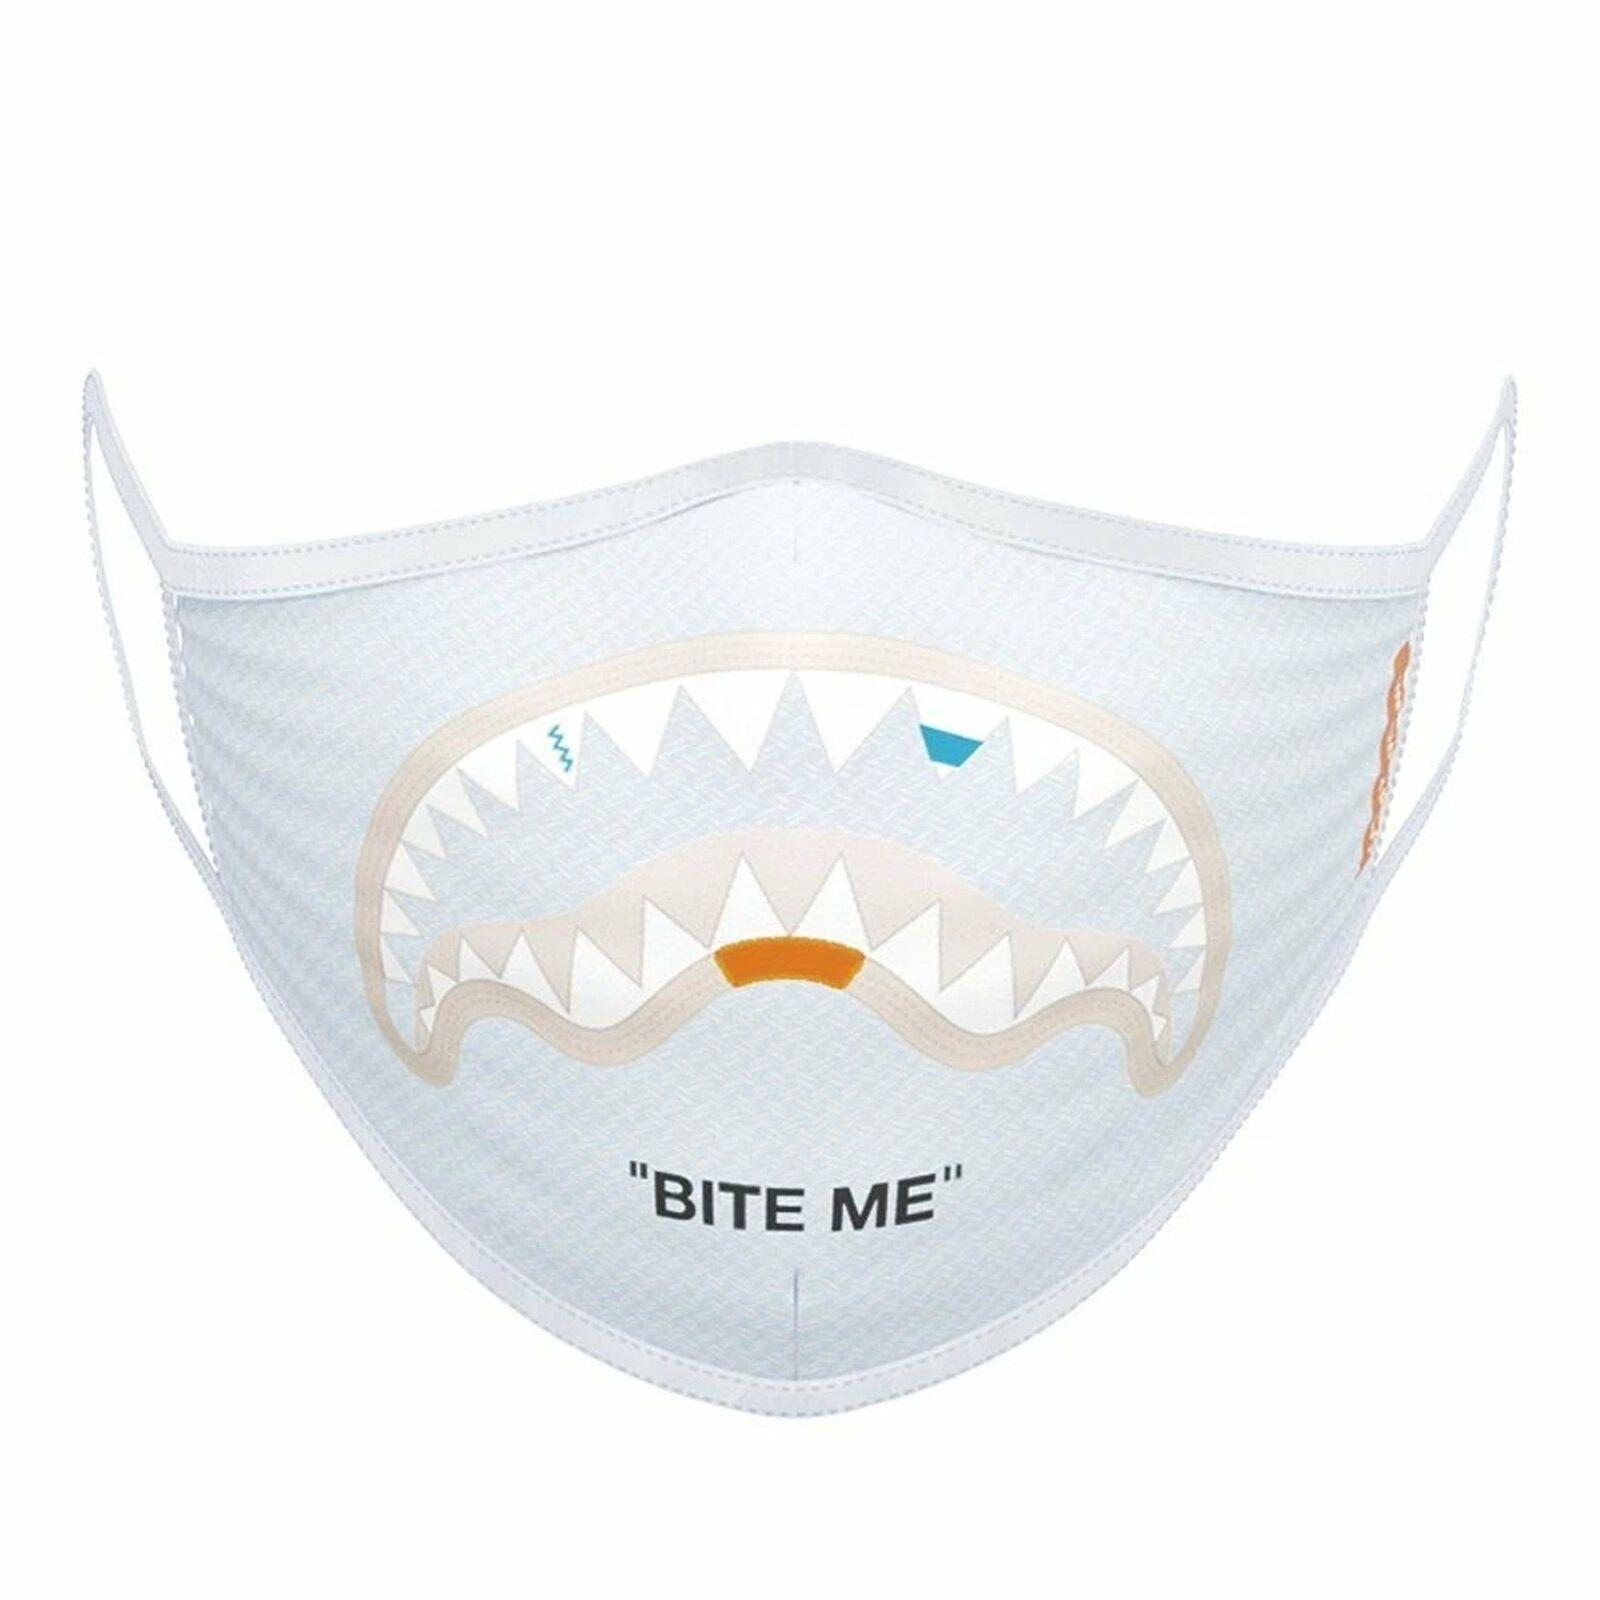 Sprayground   Z146NSZ 'Bite Me' Shark Form-Fitting Face Mask - Sky